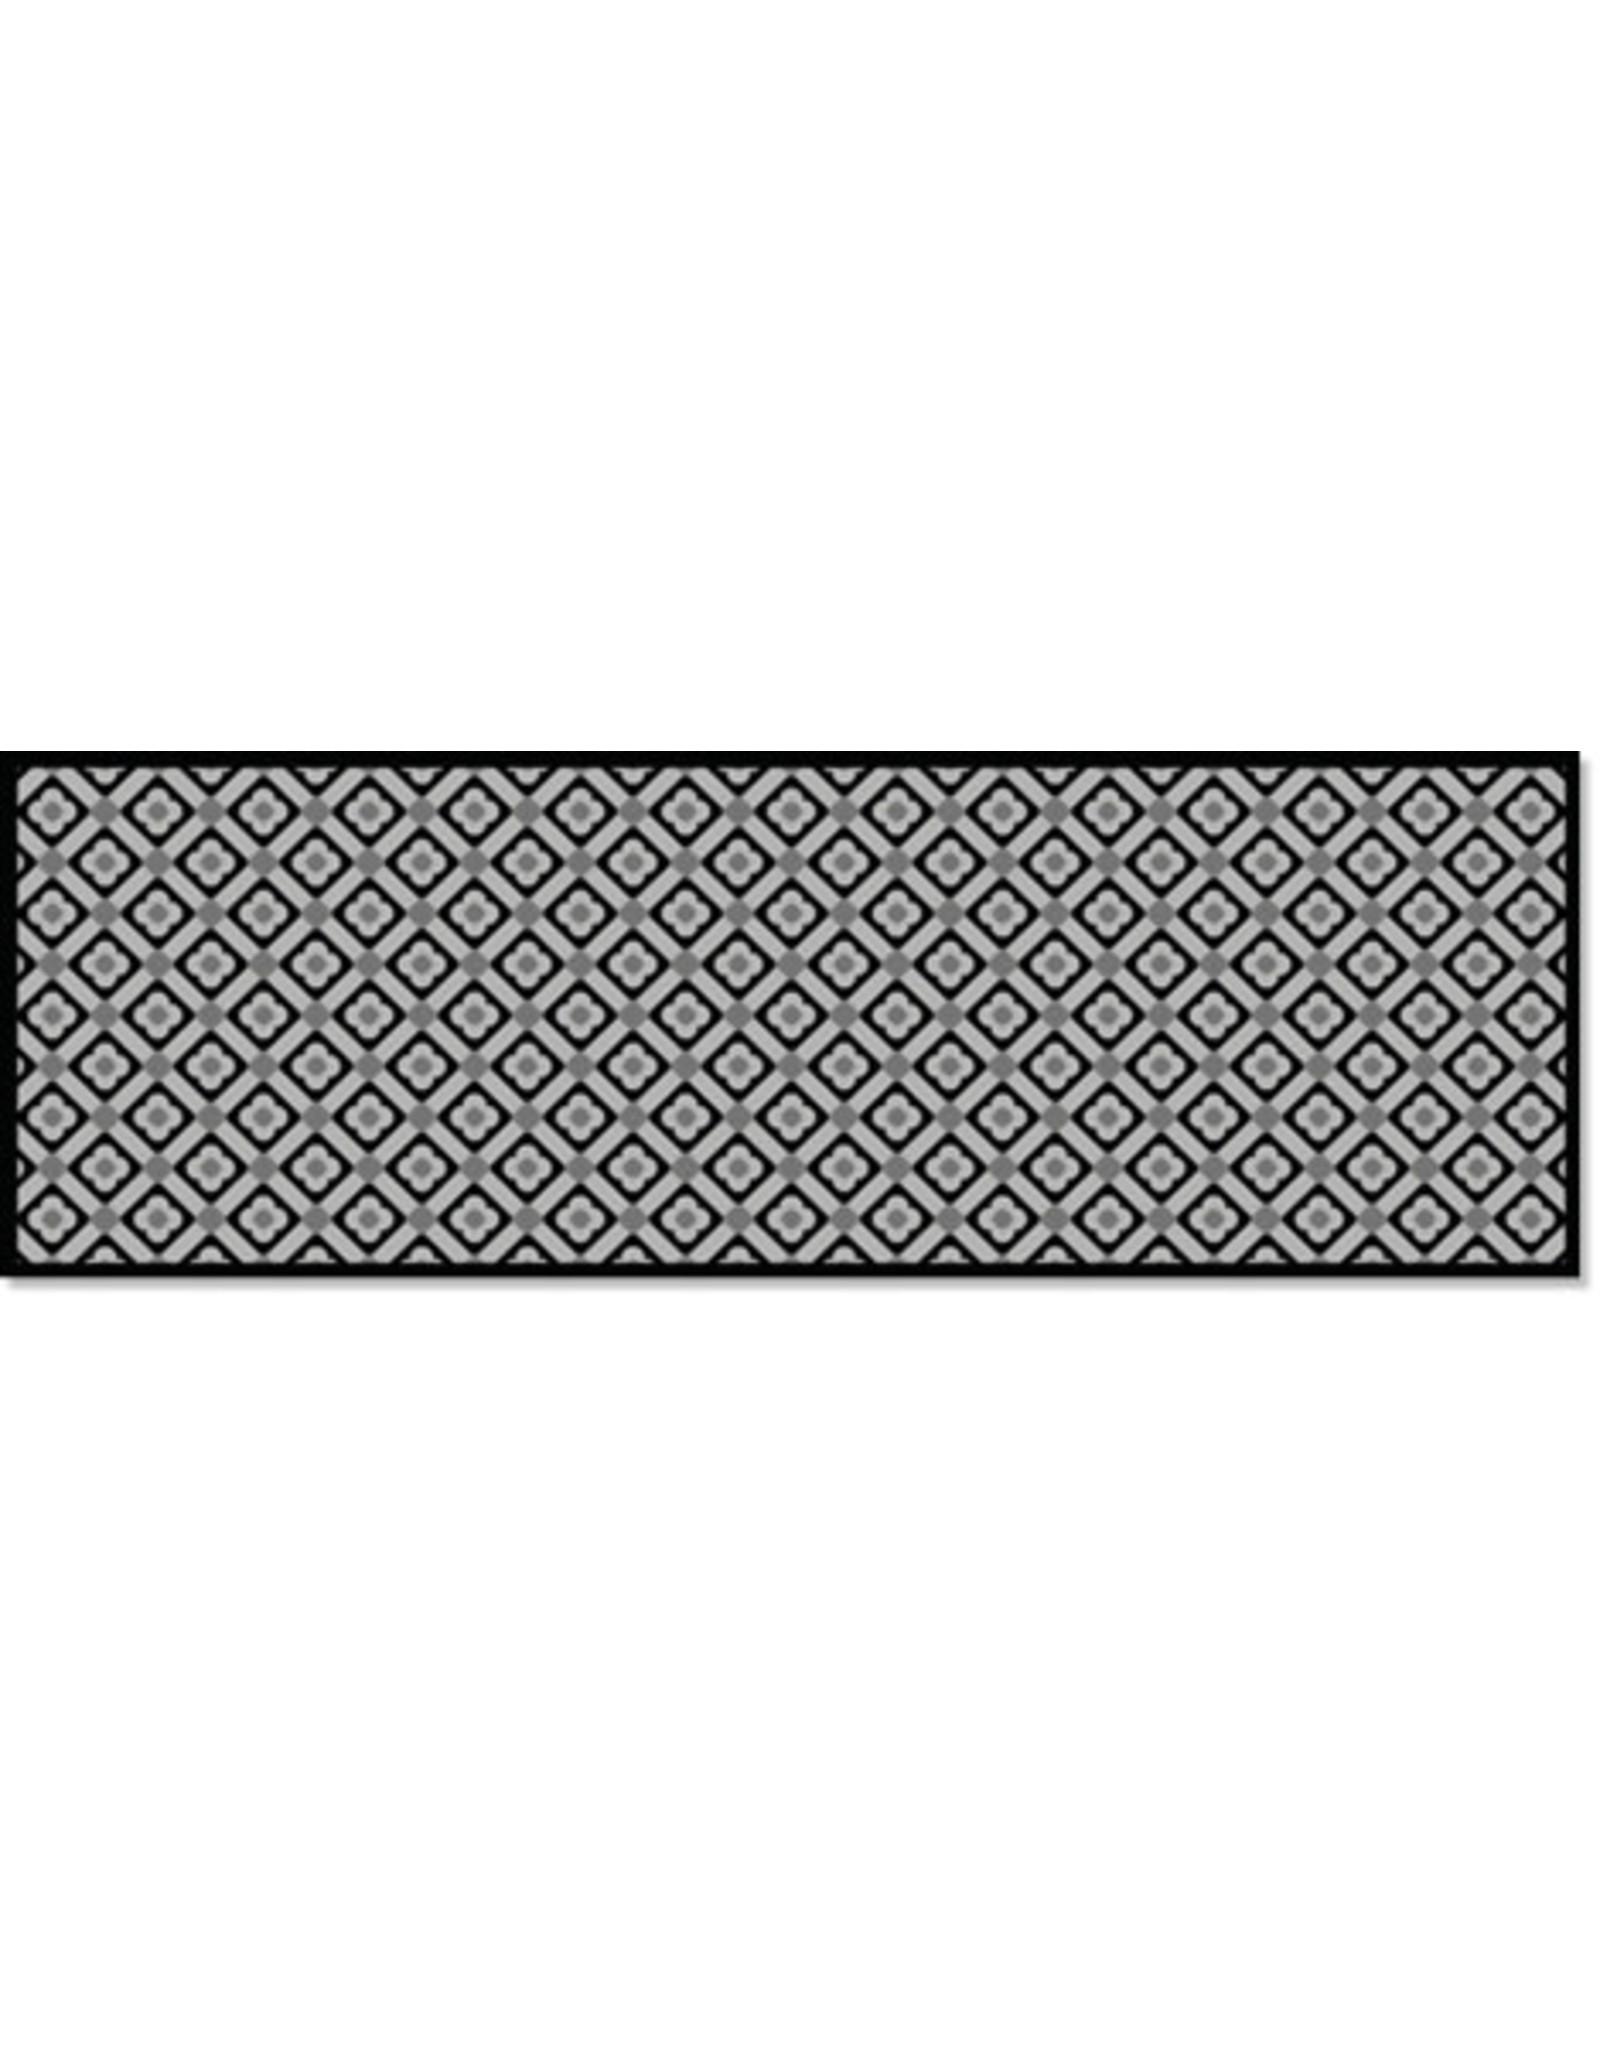 Flipper DECOSOFT TILES ZWART/WIT 50X150 RUITER